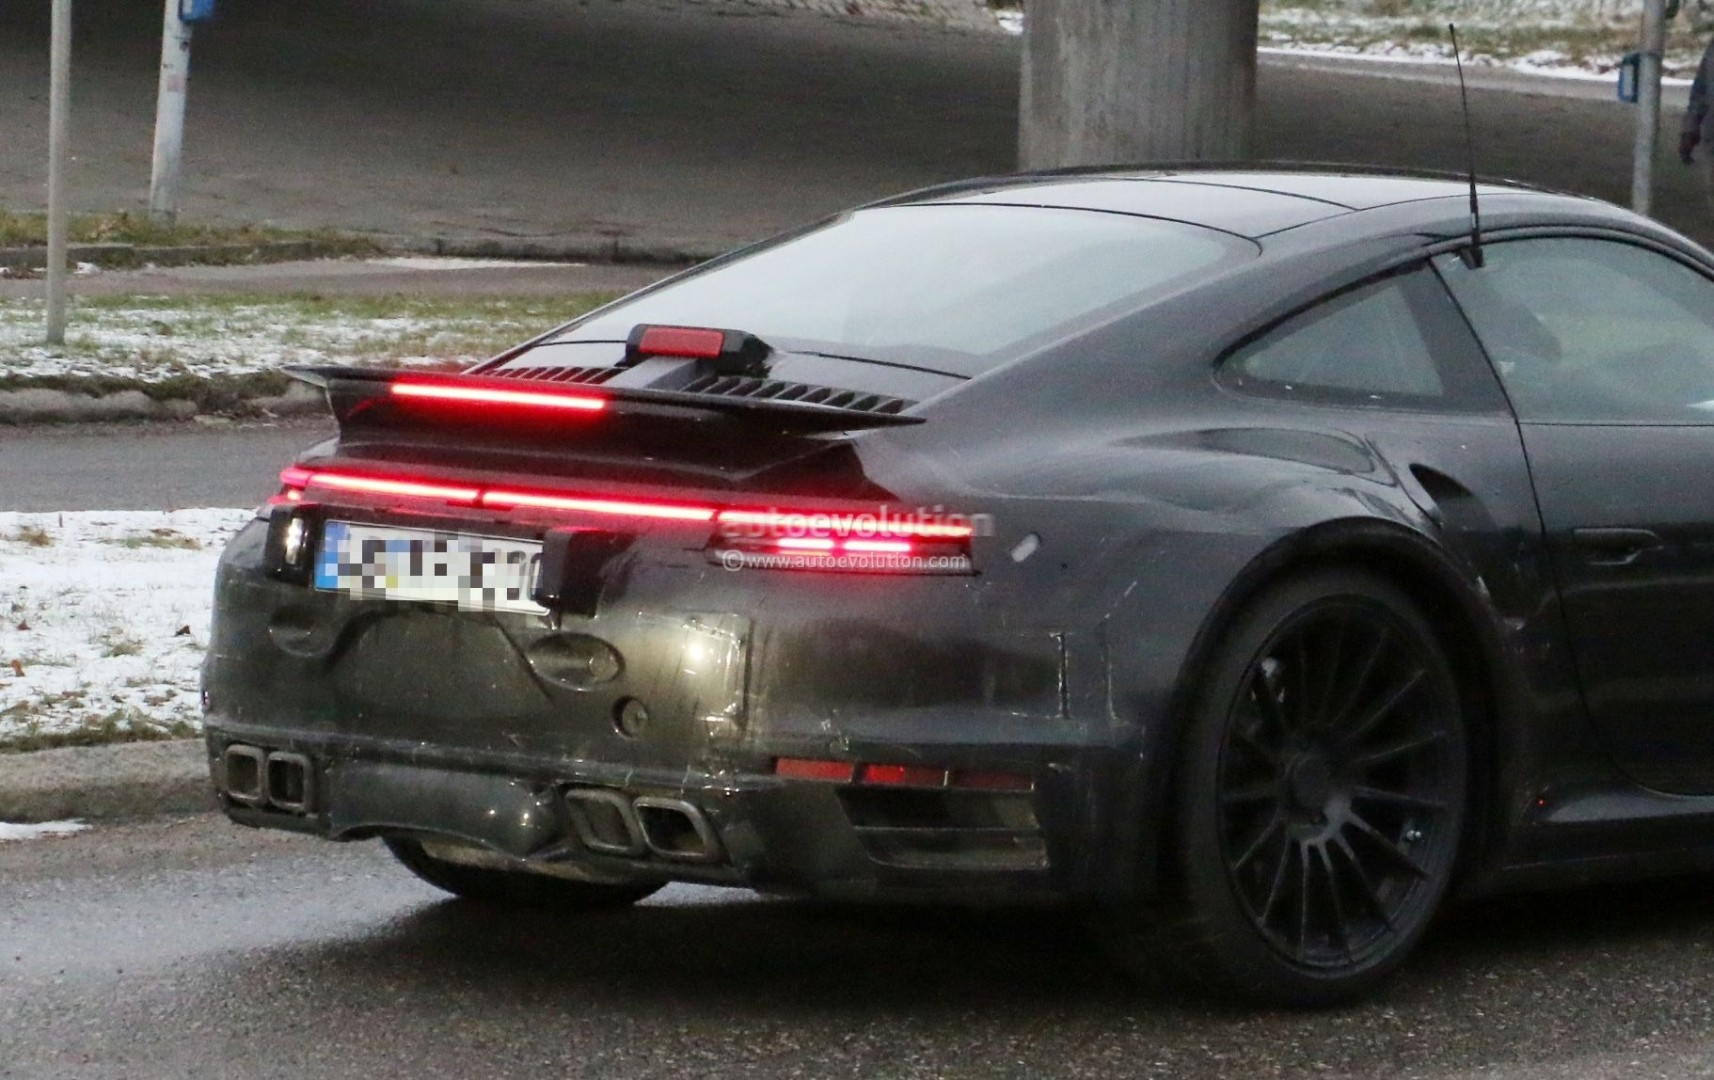 Spyshots 2020 Porsche 911 Turbo Spied In Production Trim